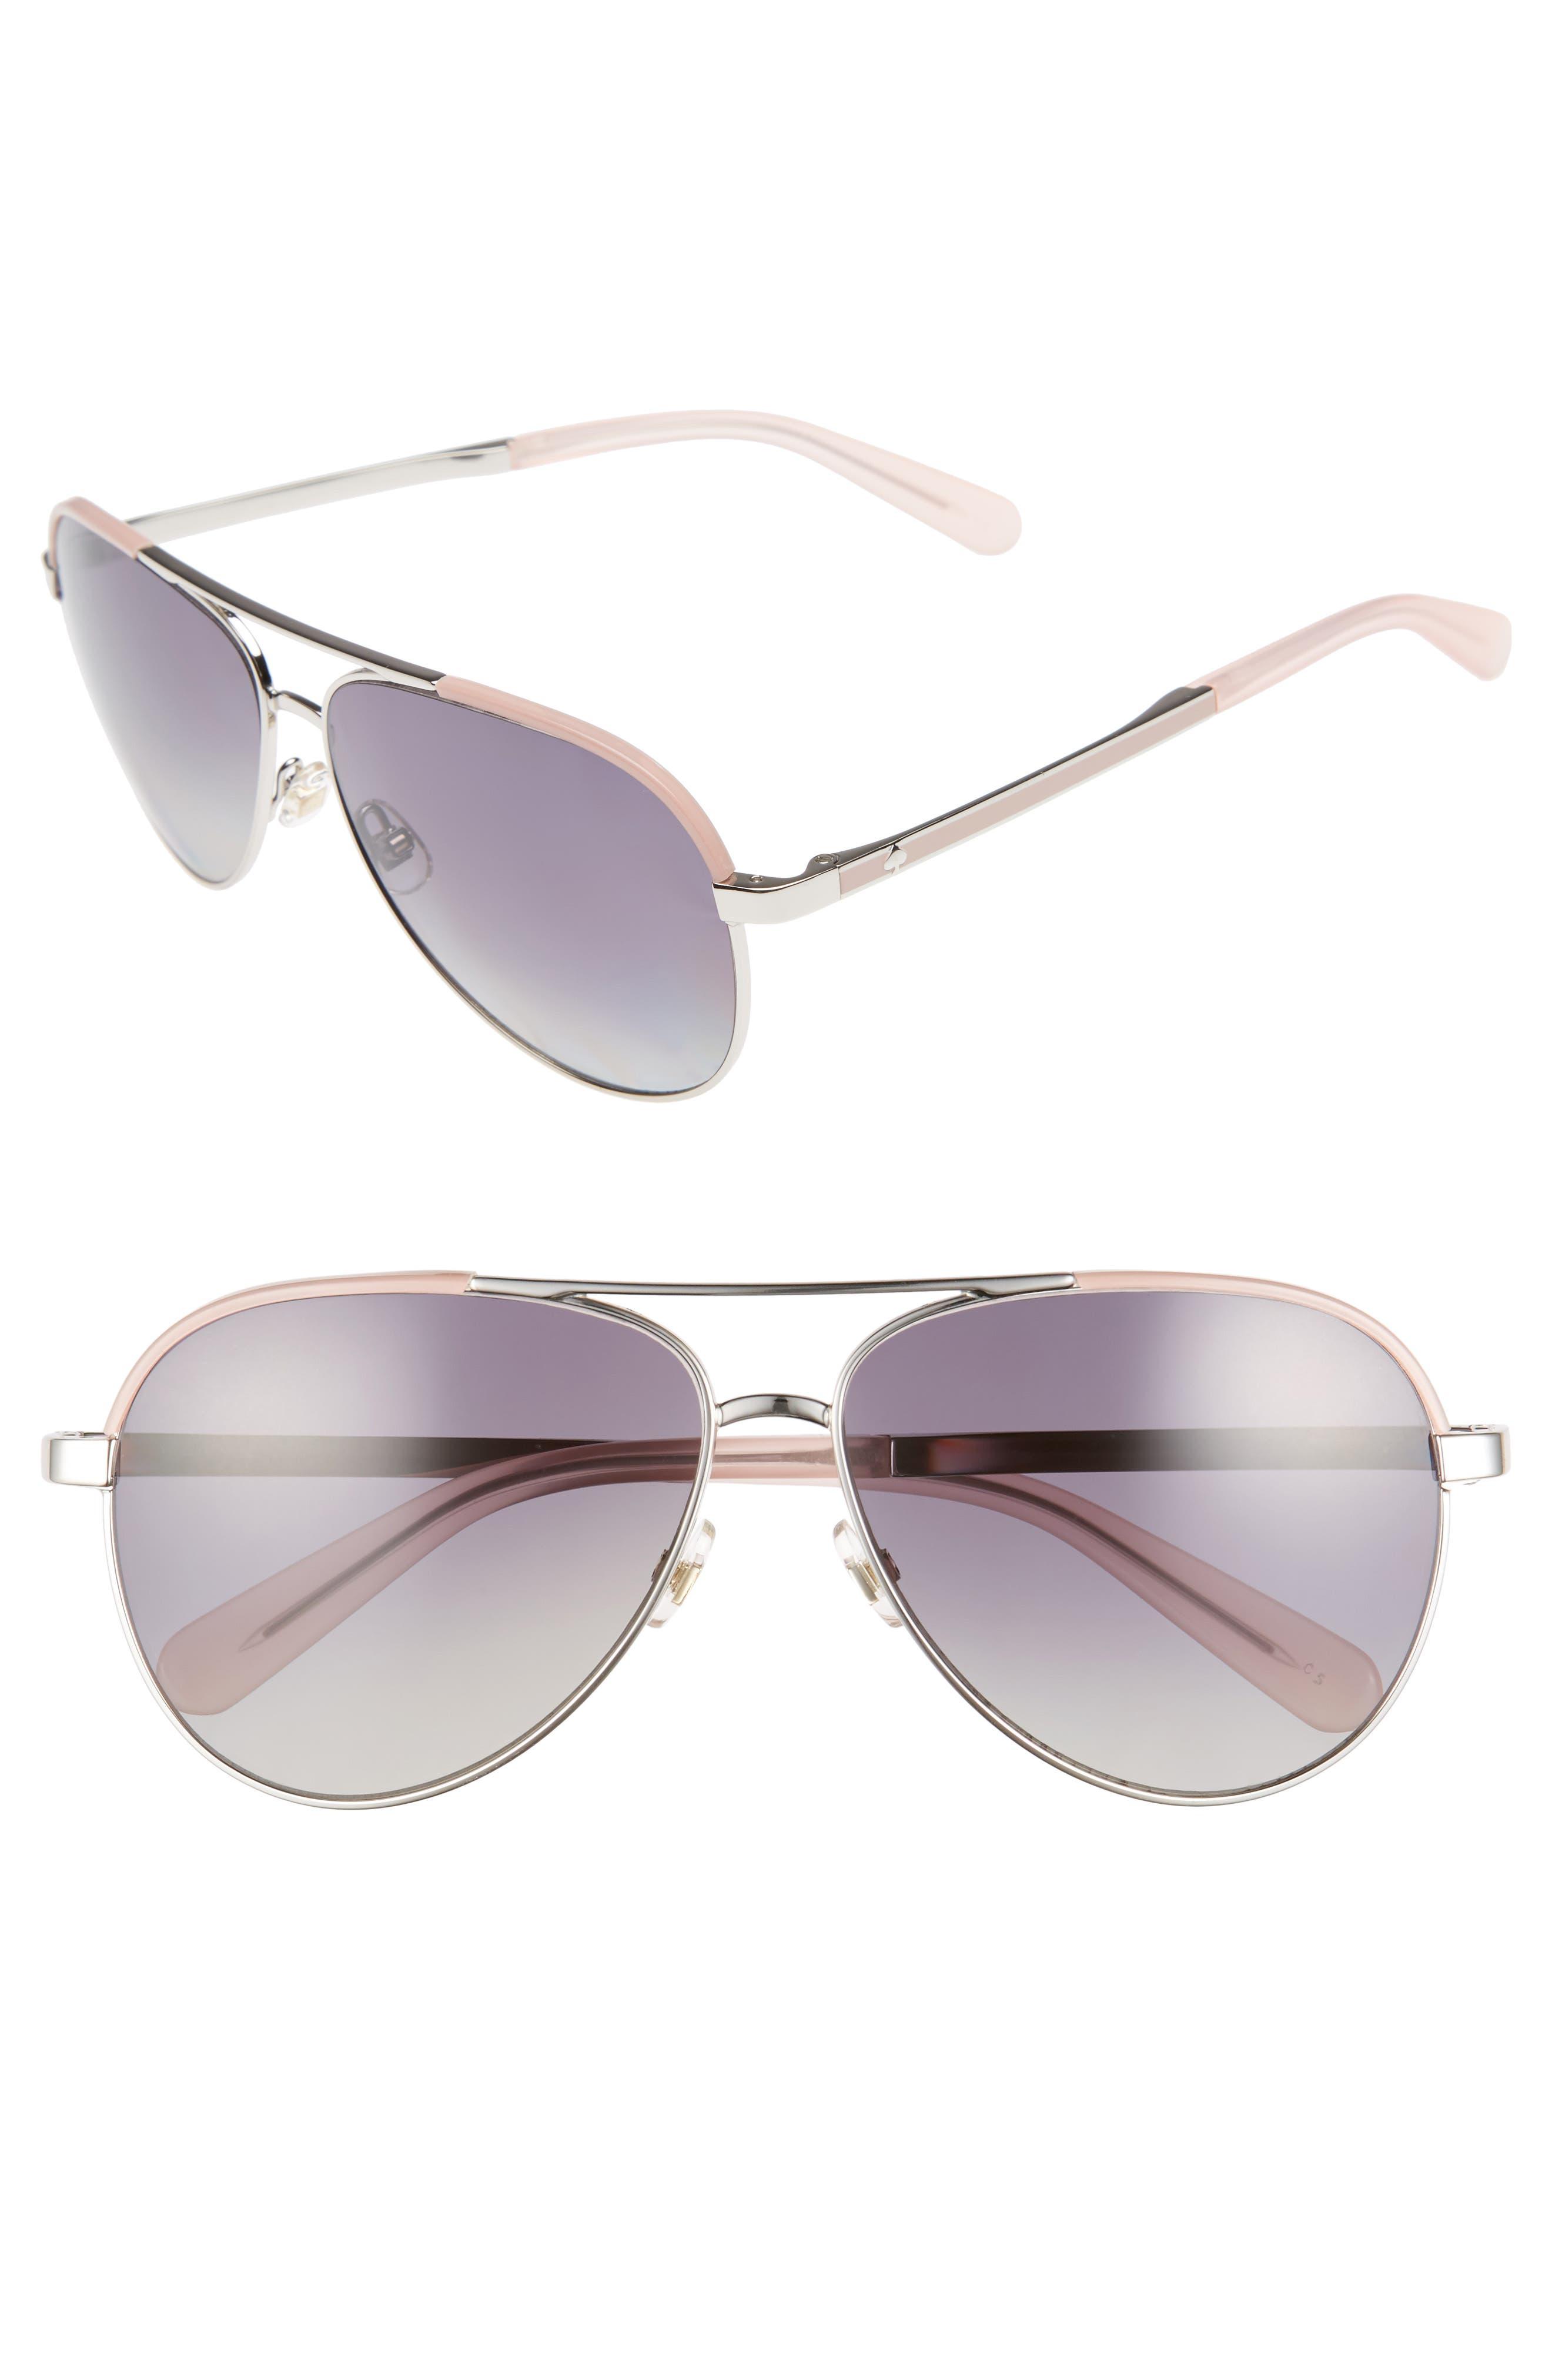 amarissa 59mm polarized aviator sunglasses,                             Main thumbnail 1, color,                             040